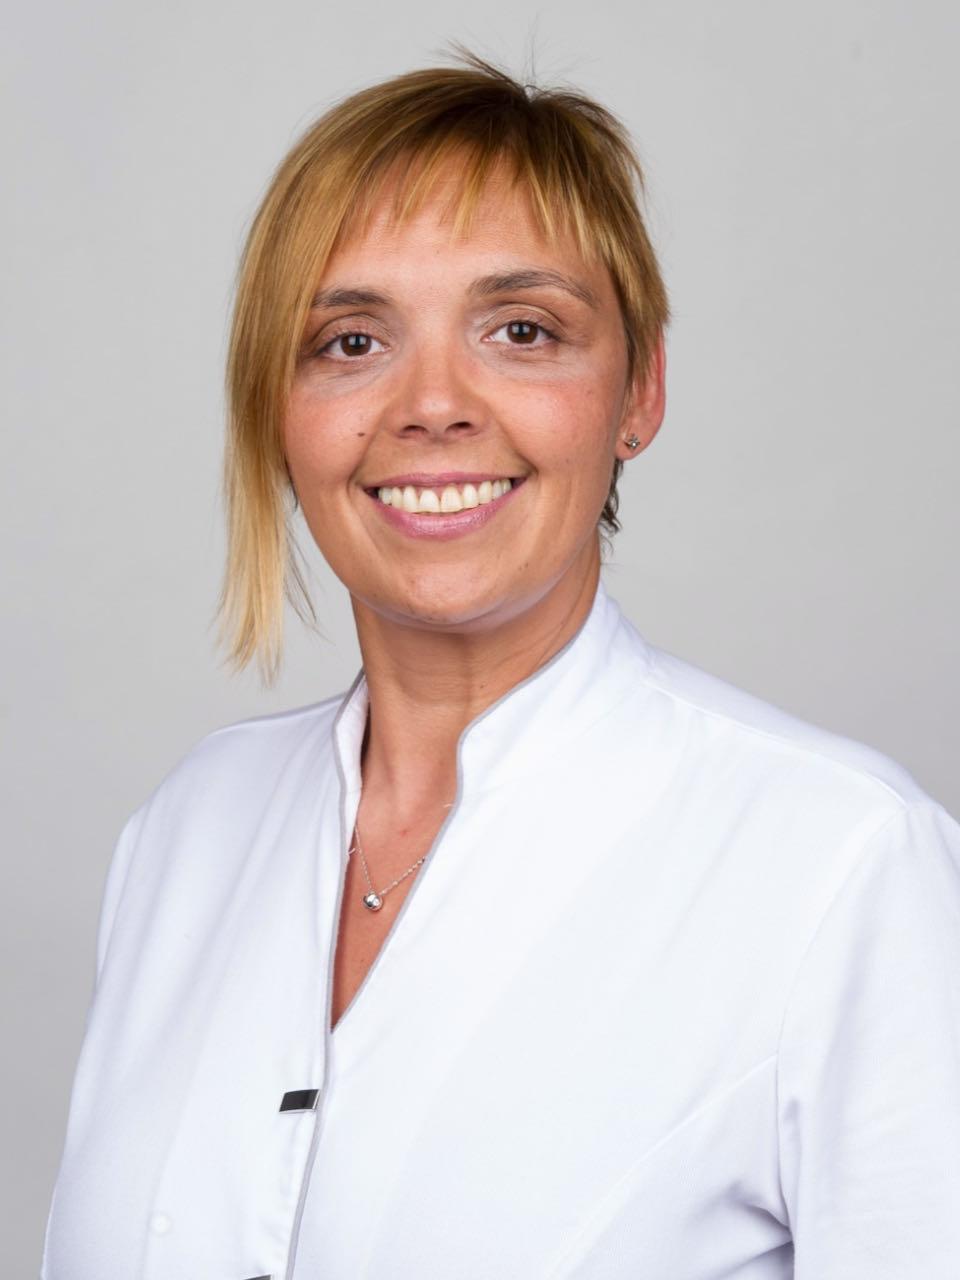 Sra. Elísabeth Màrquez Plana